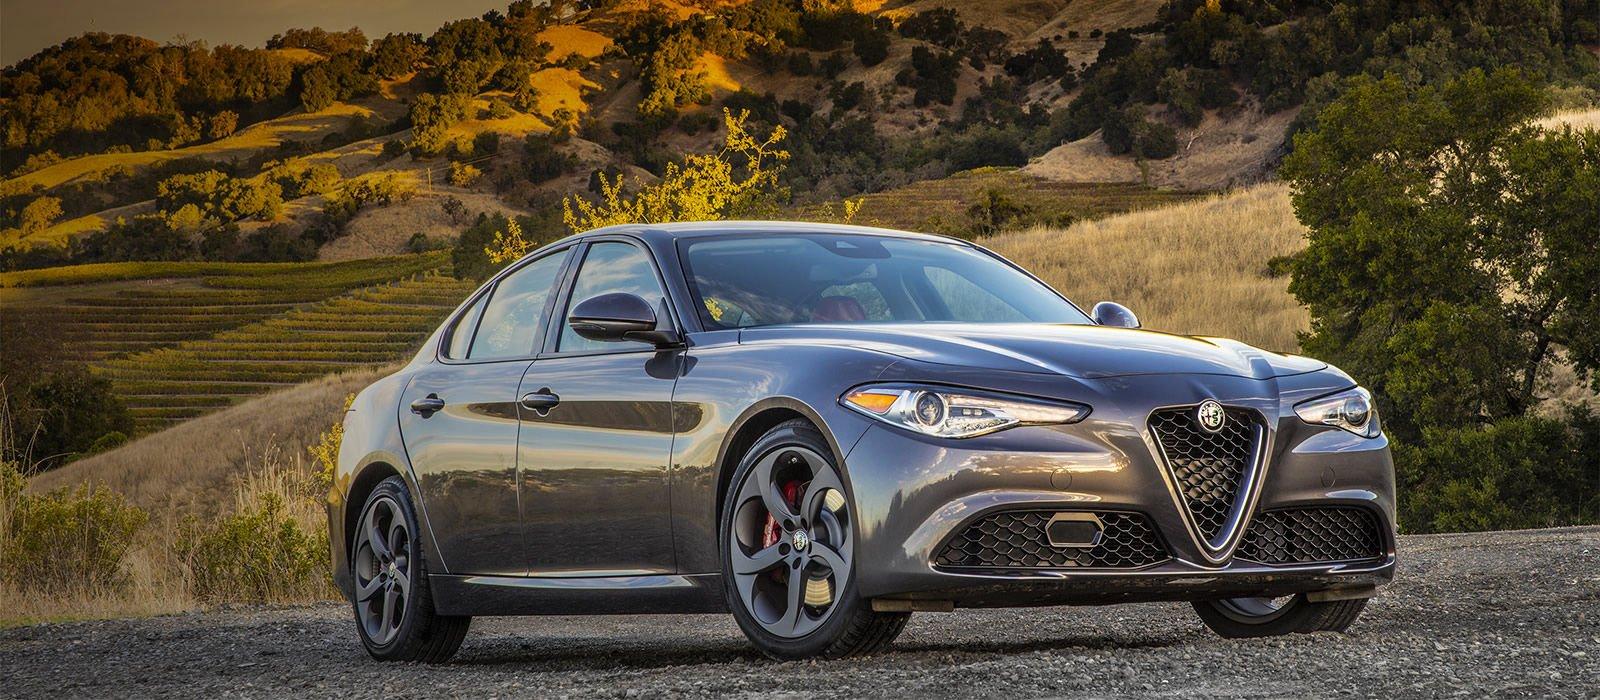 New Alfa Romeo Giulia Price Lease Offers Austin Tx Msrp On Sale Near